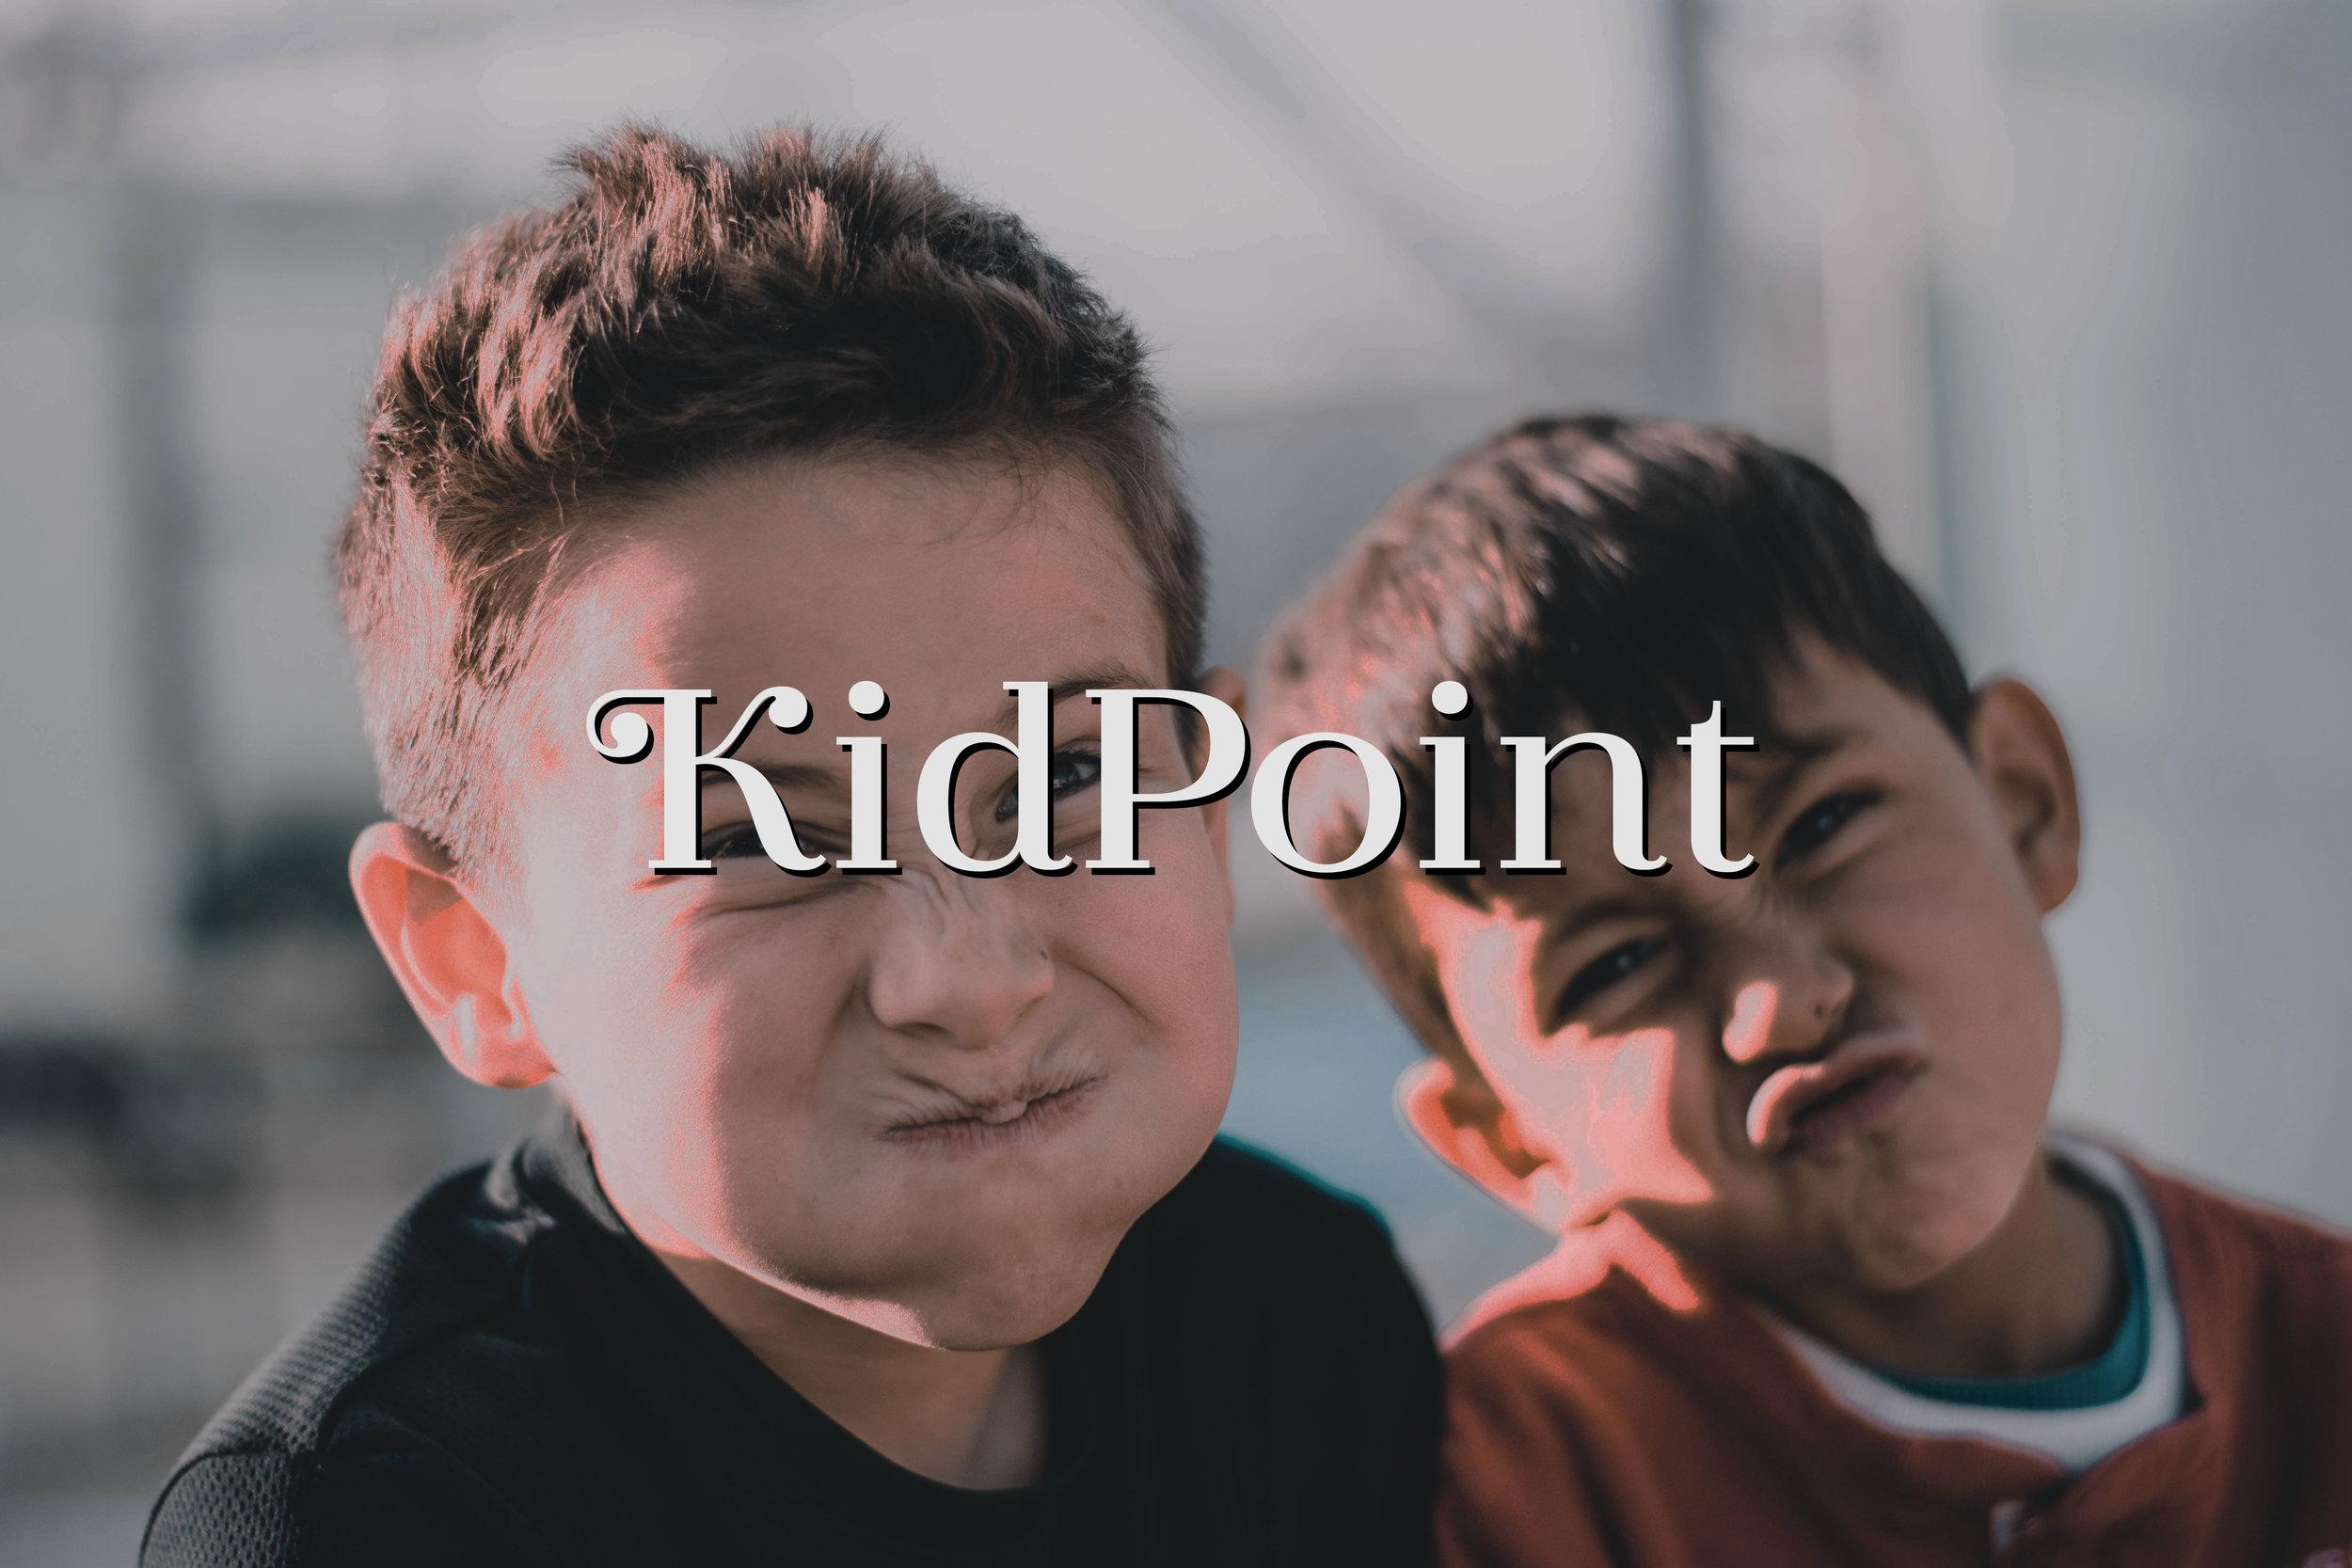 KidPoint Click Thru Image.jpg